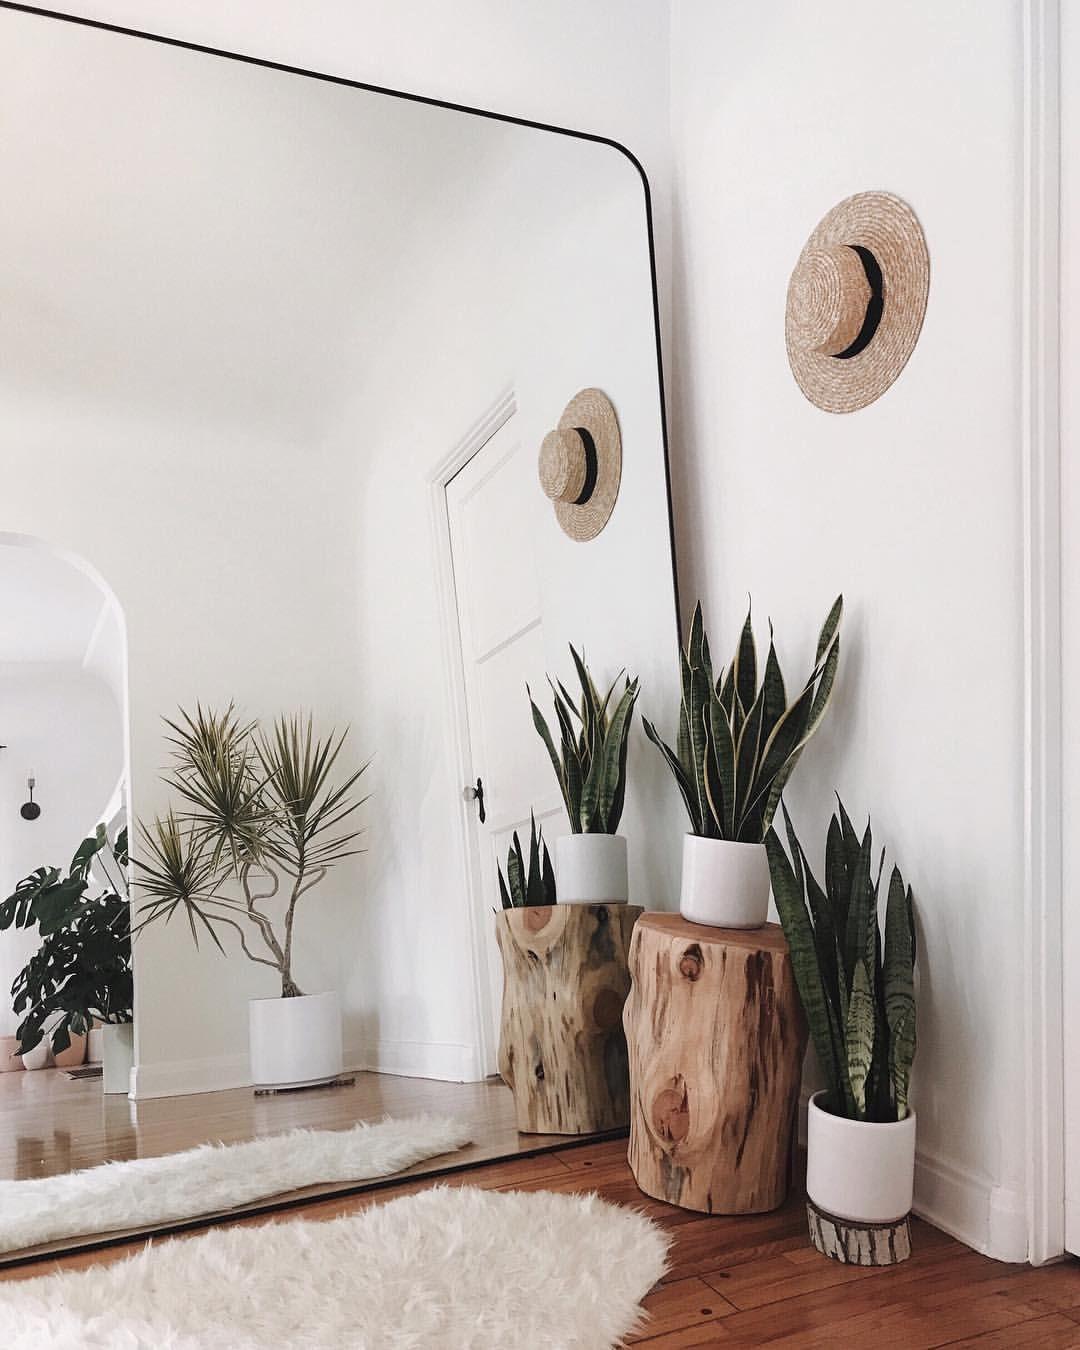 Interior Design Inspiration Large Mirror Walls Green Living Room Plants Chic Modern Natural Living Spaces Decor Room Decor Decor Inspiration